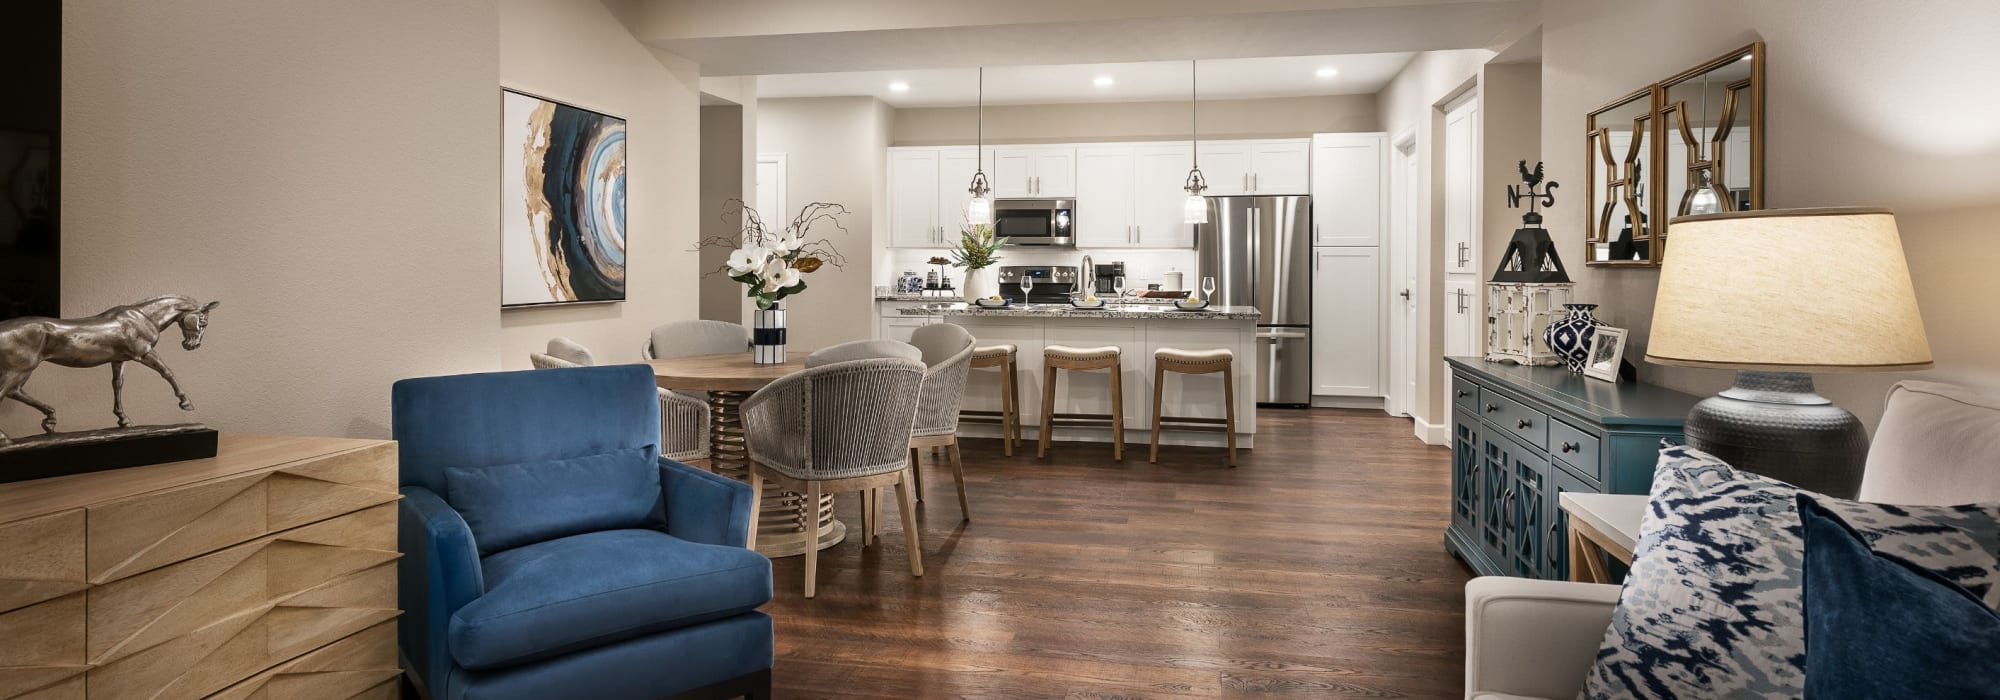 Living room with hardwood floors at San Artes in Scottsdale, Arizona